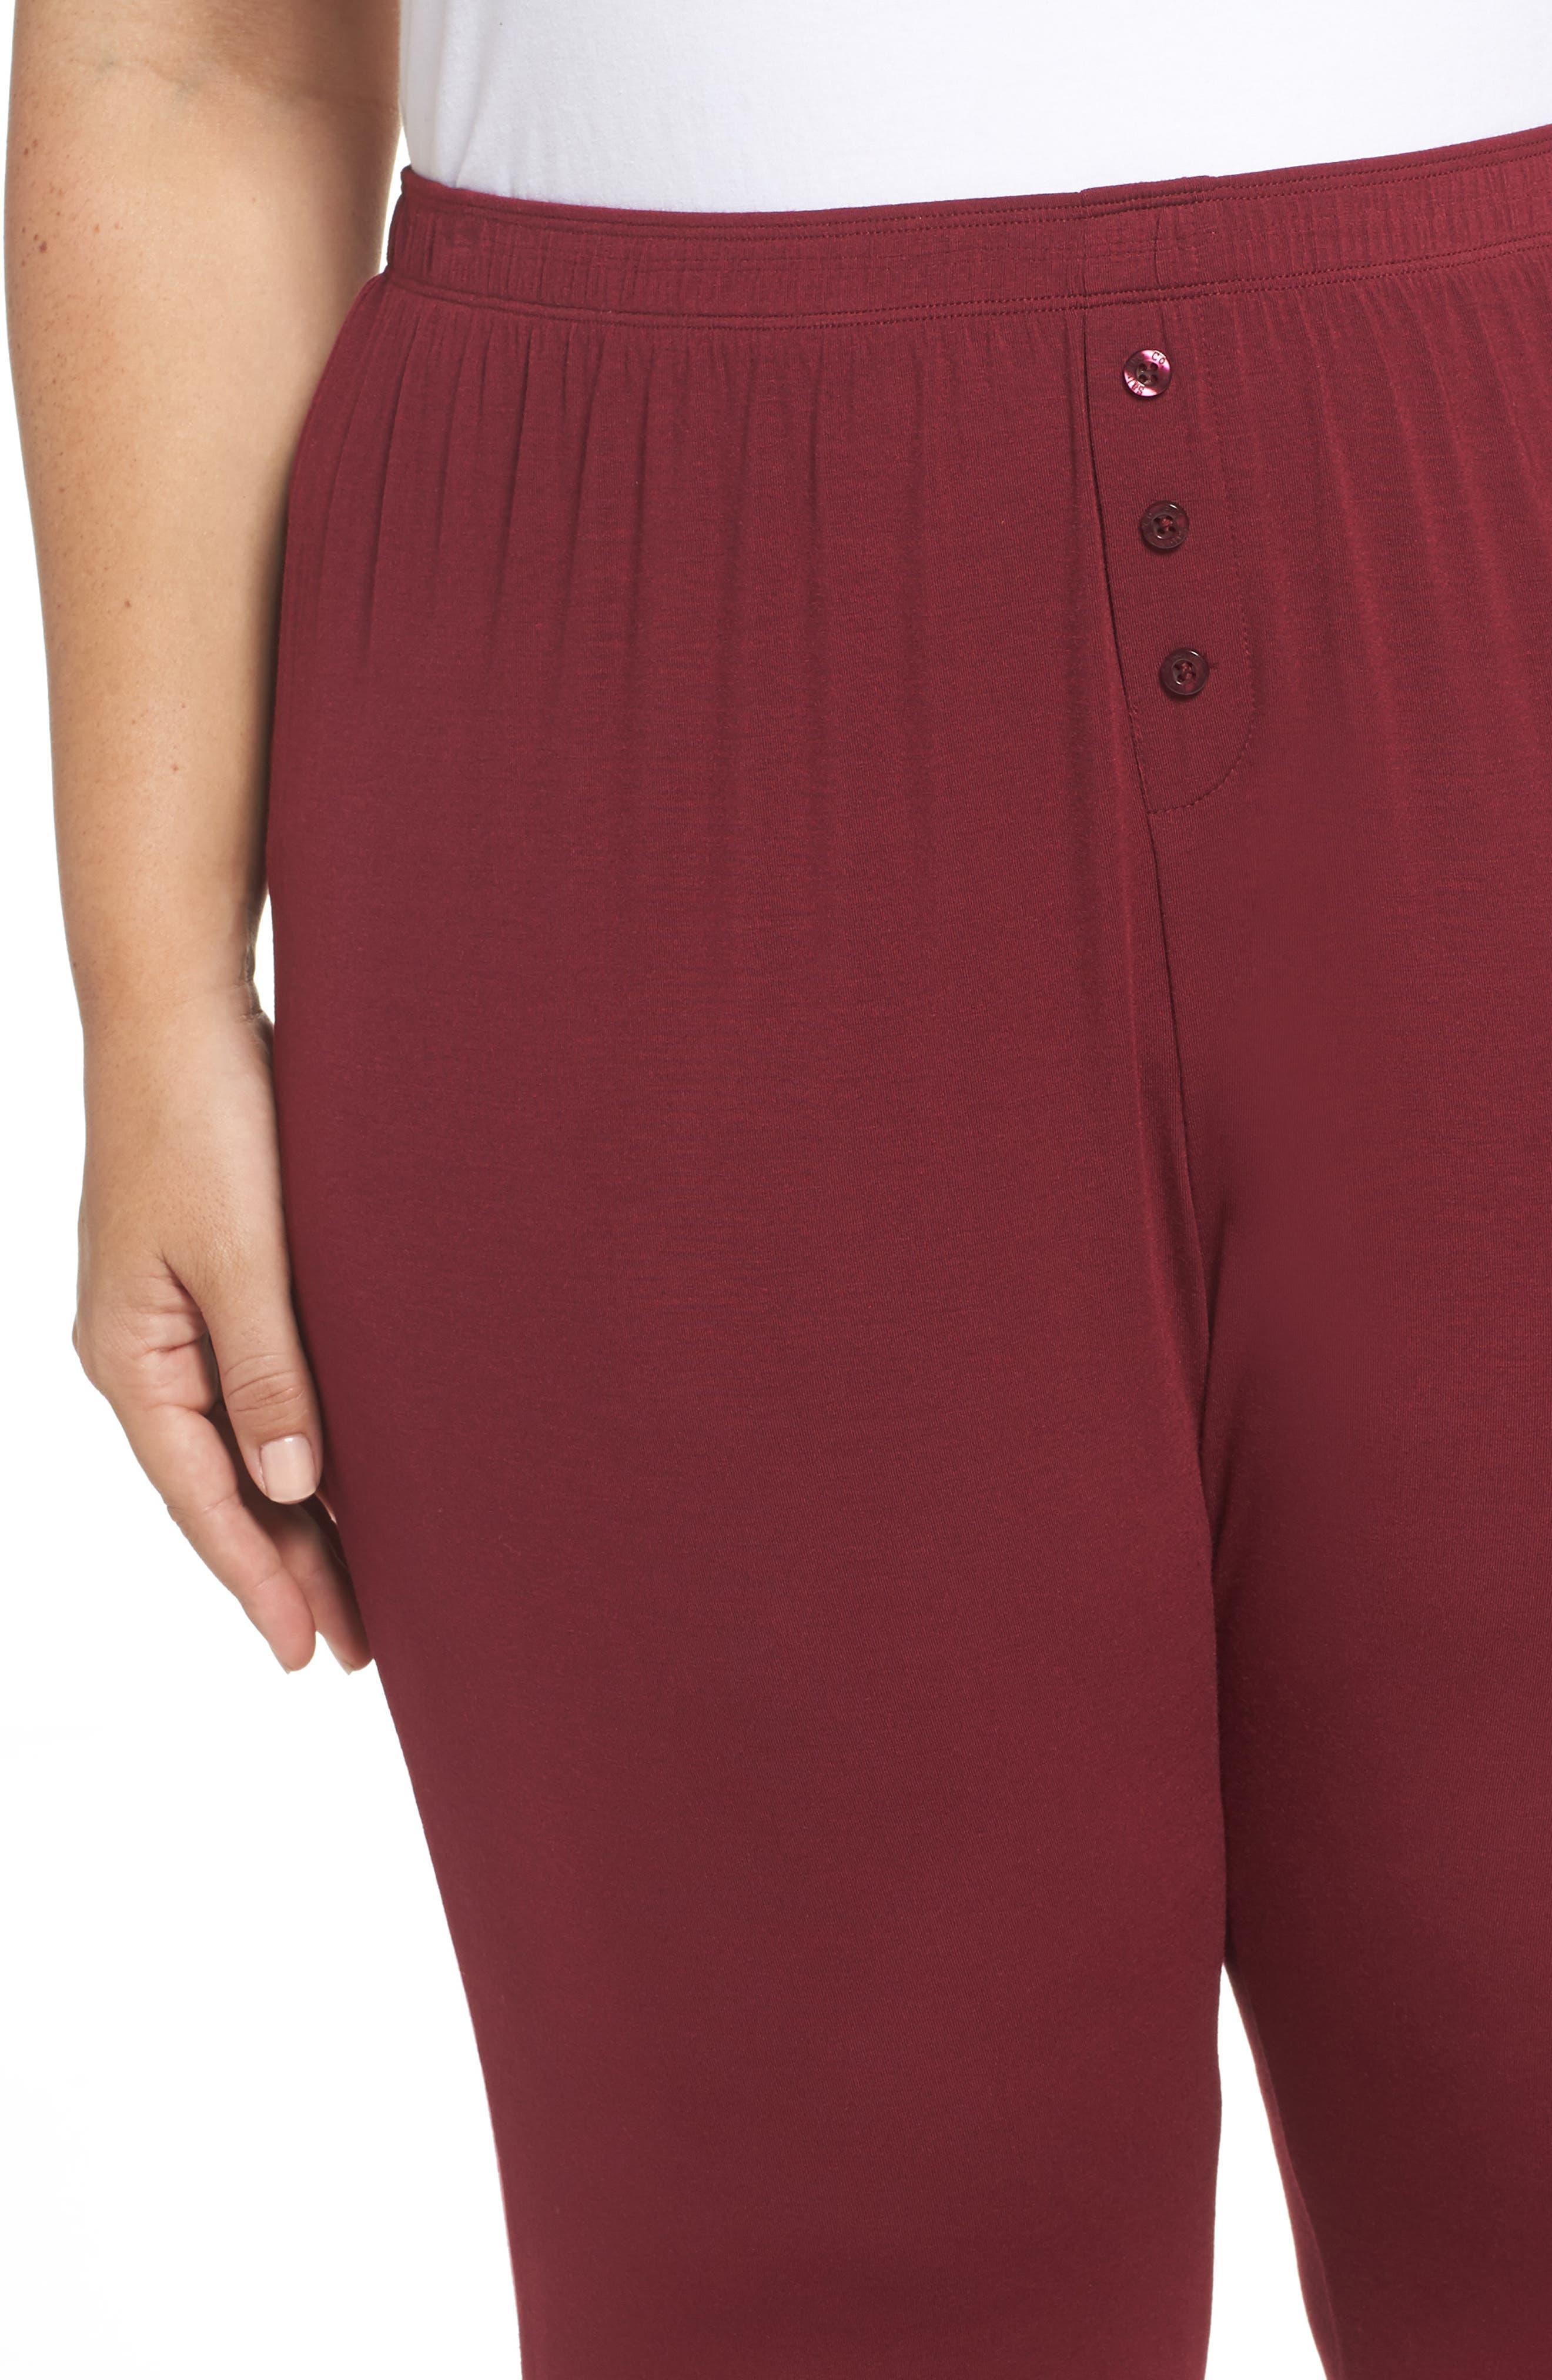 Lounge Pants,                             Alternate thumbnail 4, color,                             930